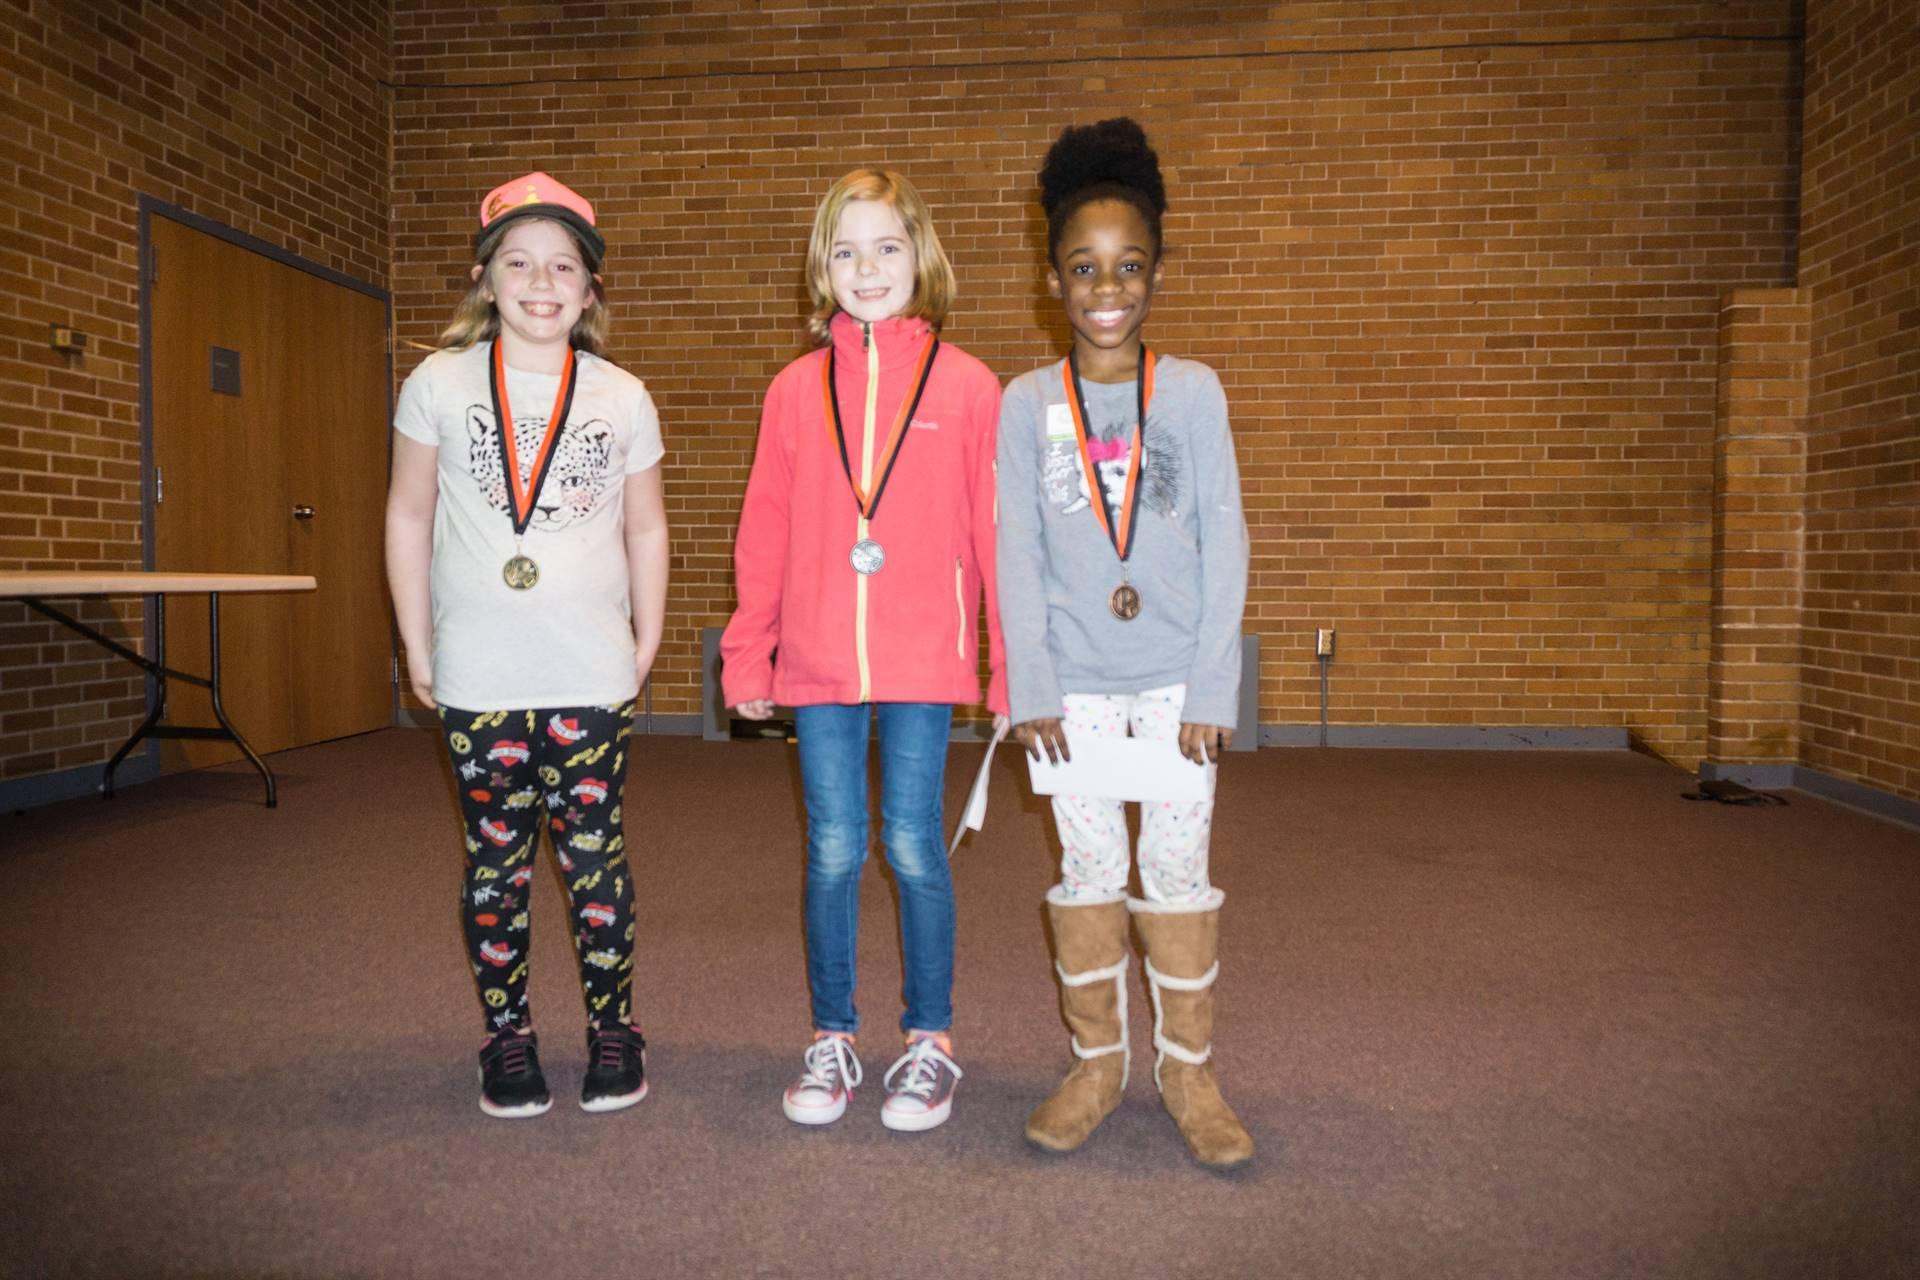 3-D Winning Students